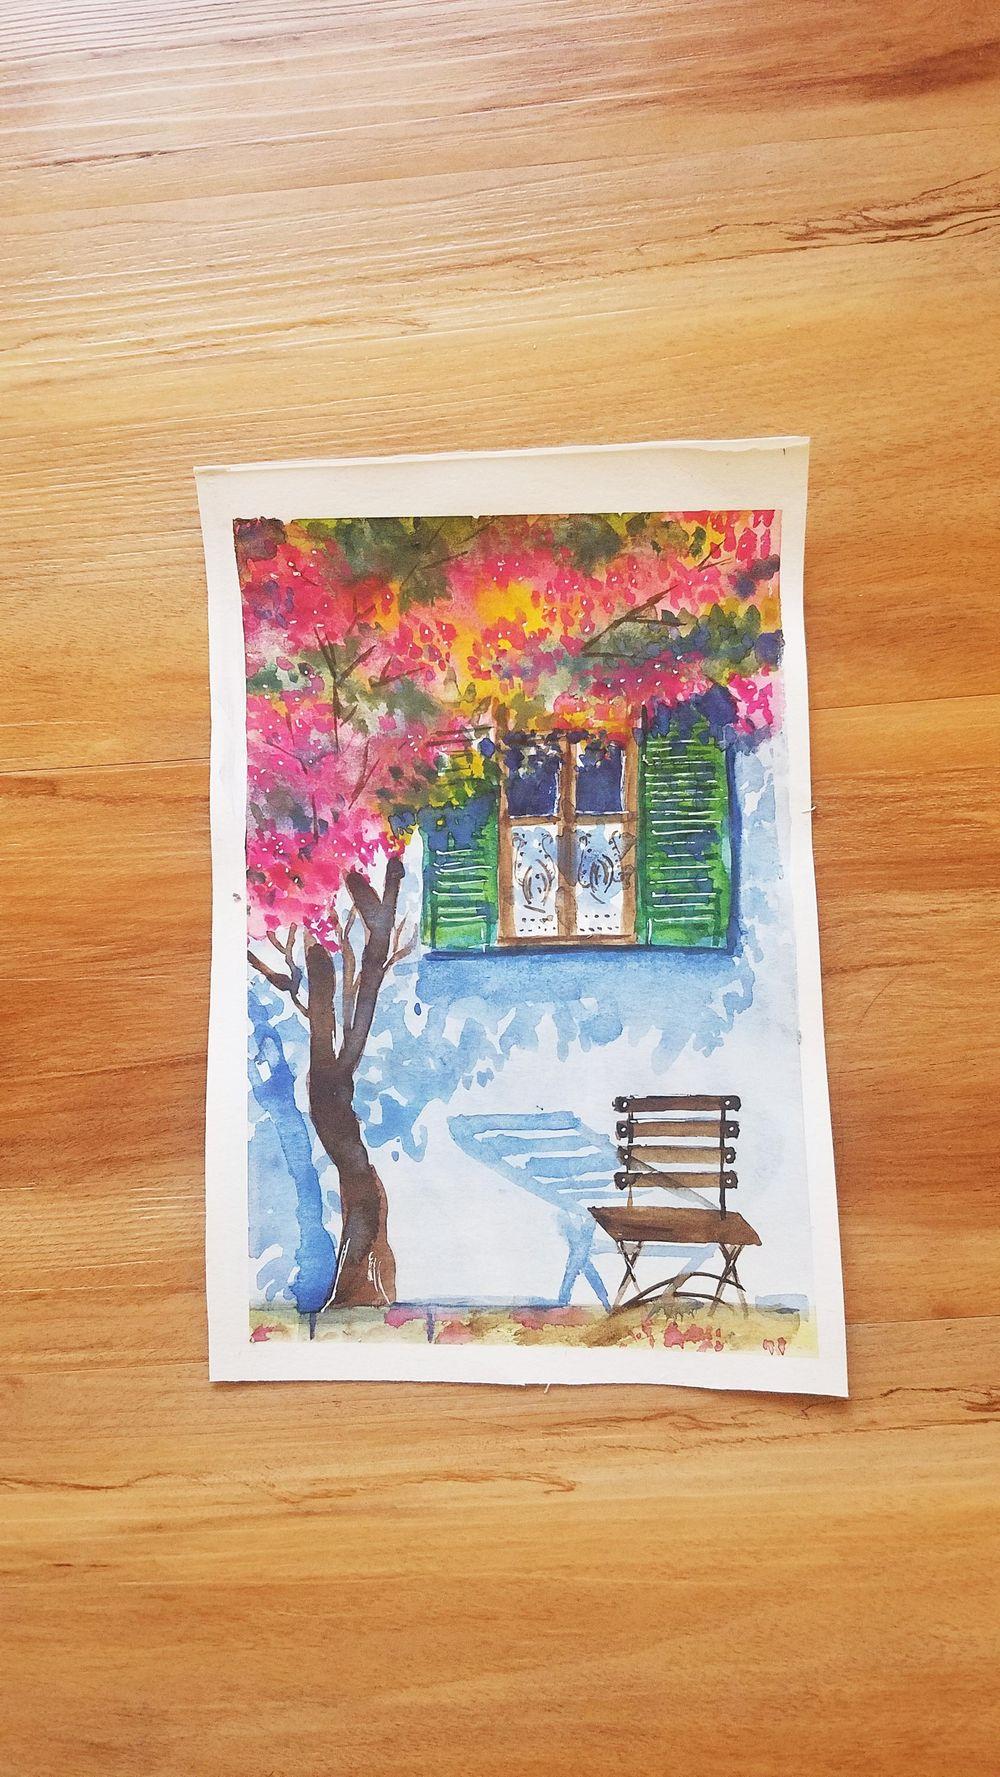 Watercolor Urban Landscape - image 1 - student project